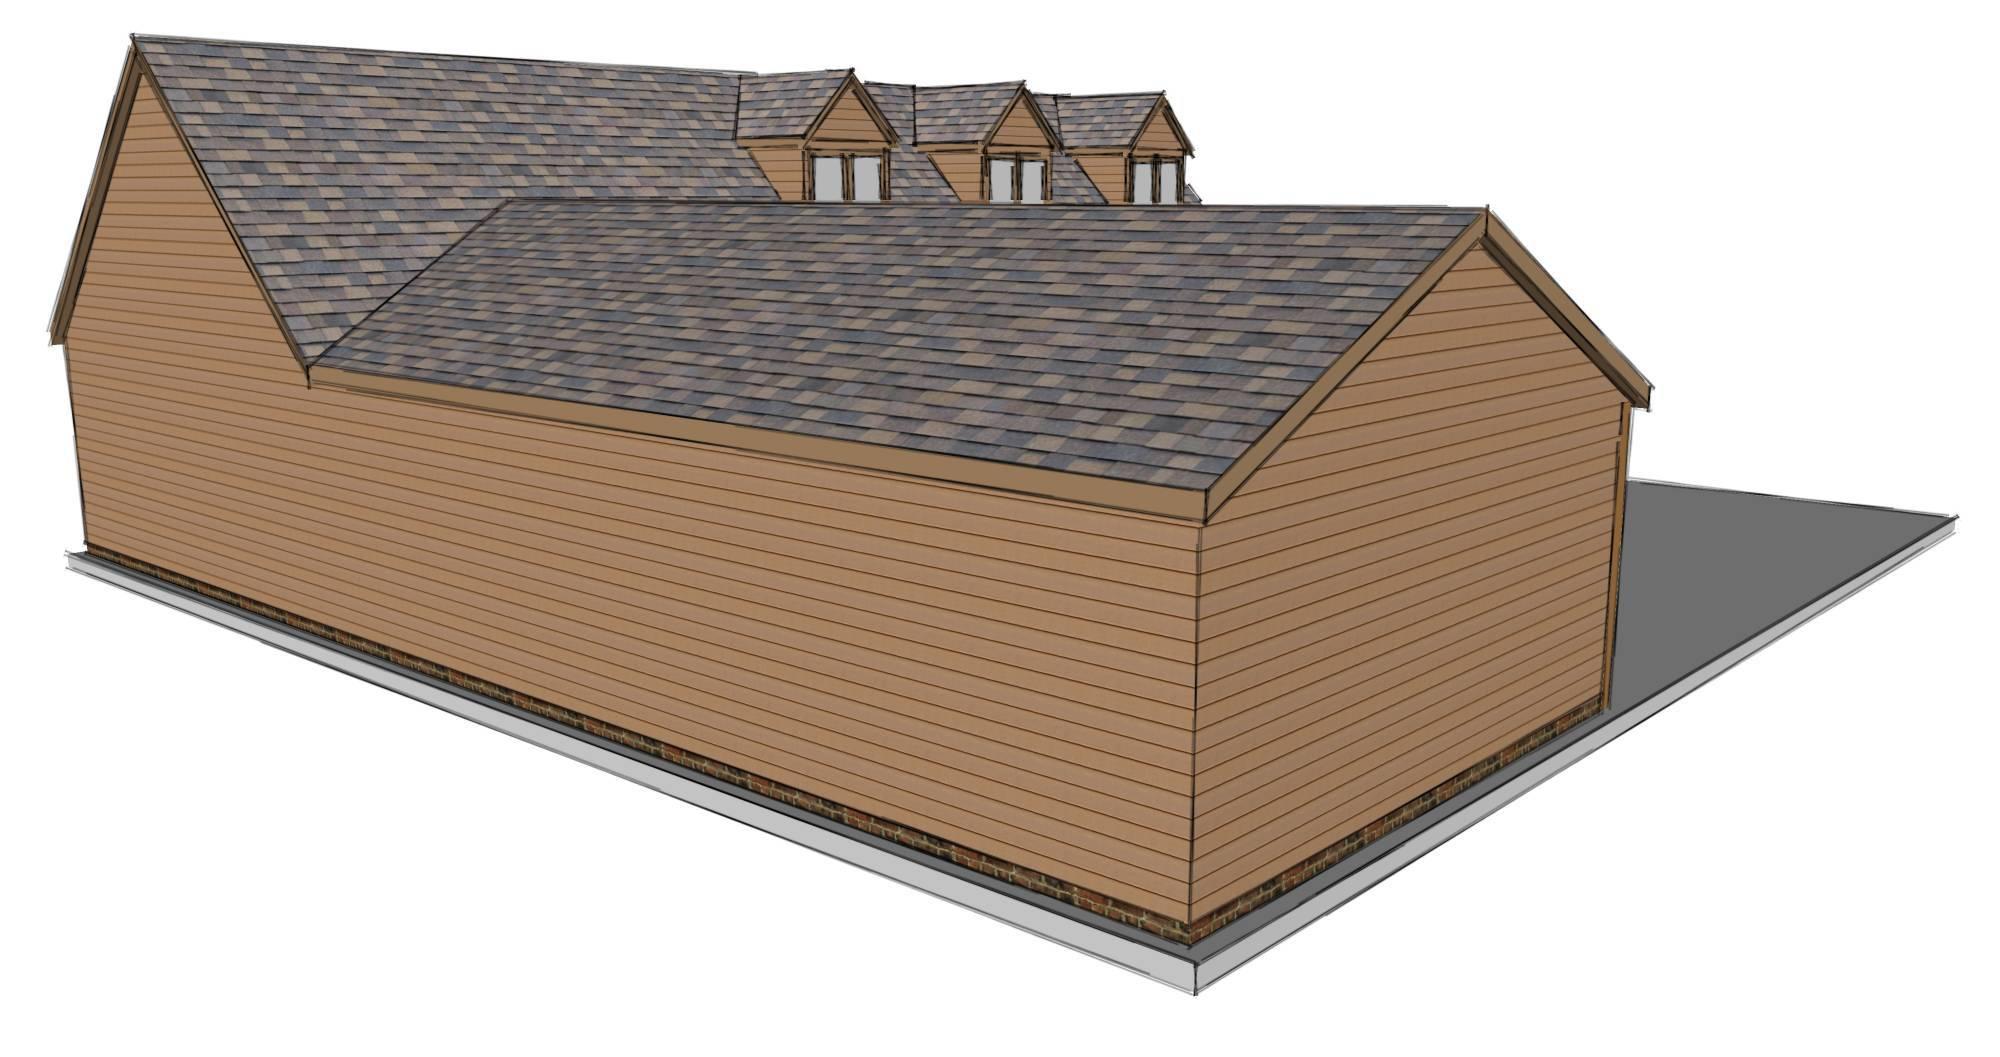 L Shaped Garage Scheme - Stable Company